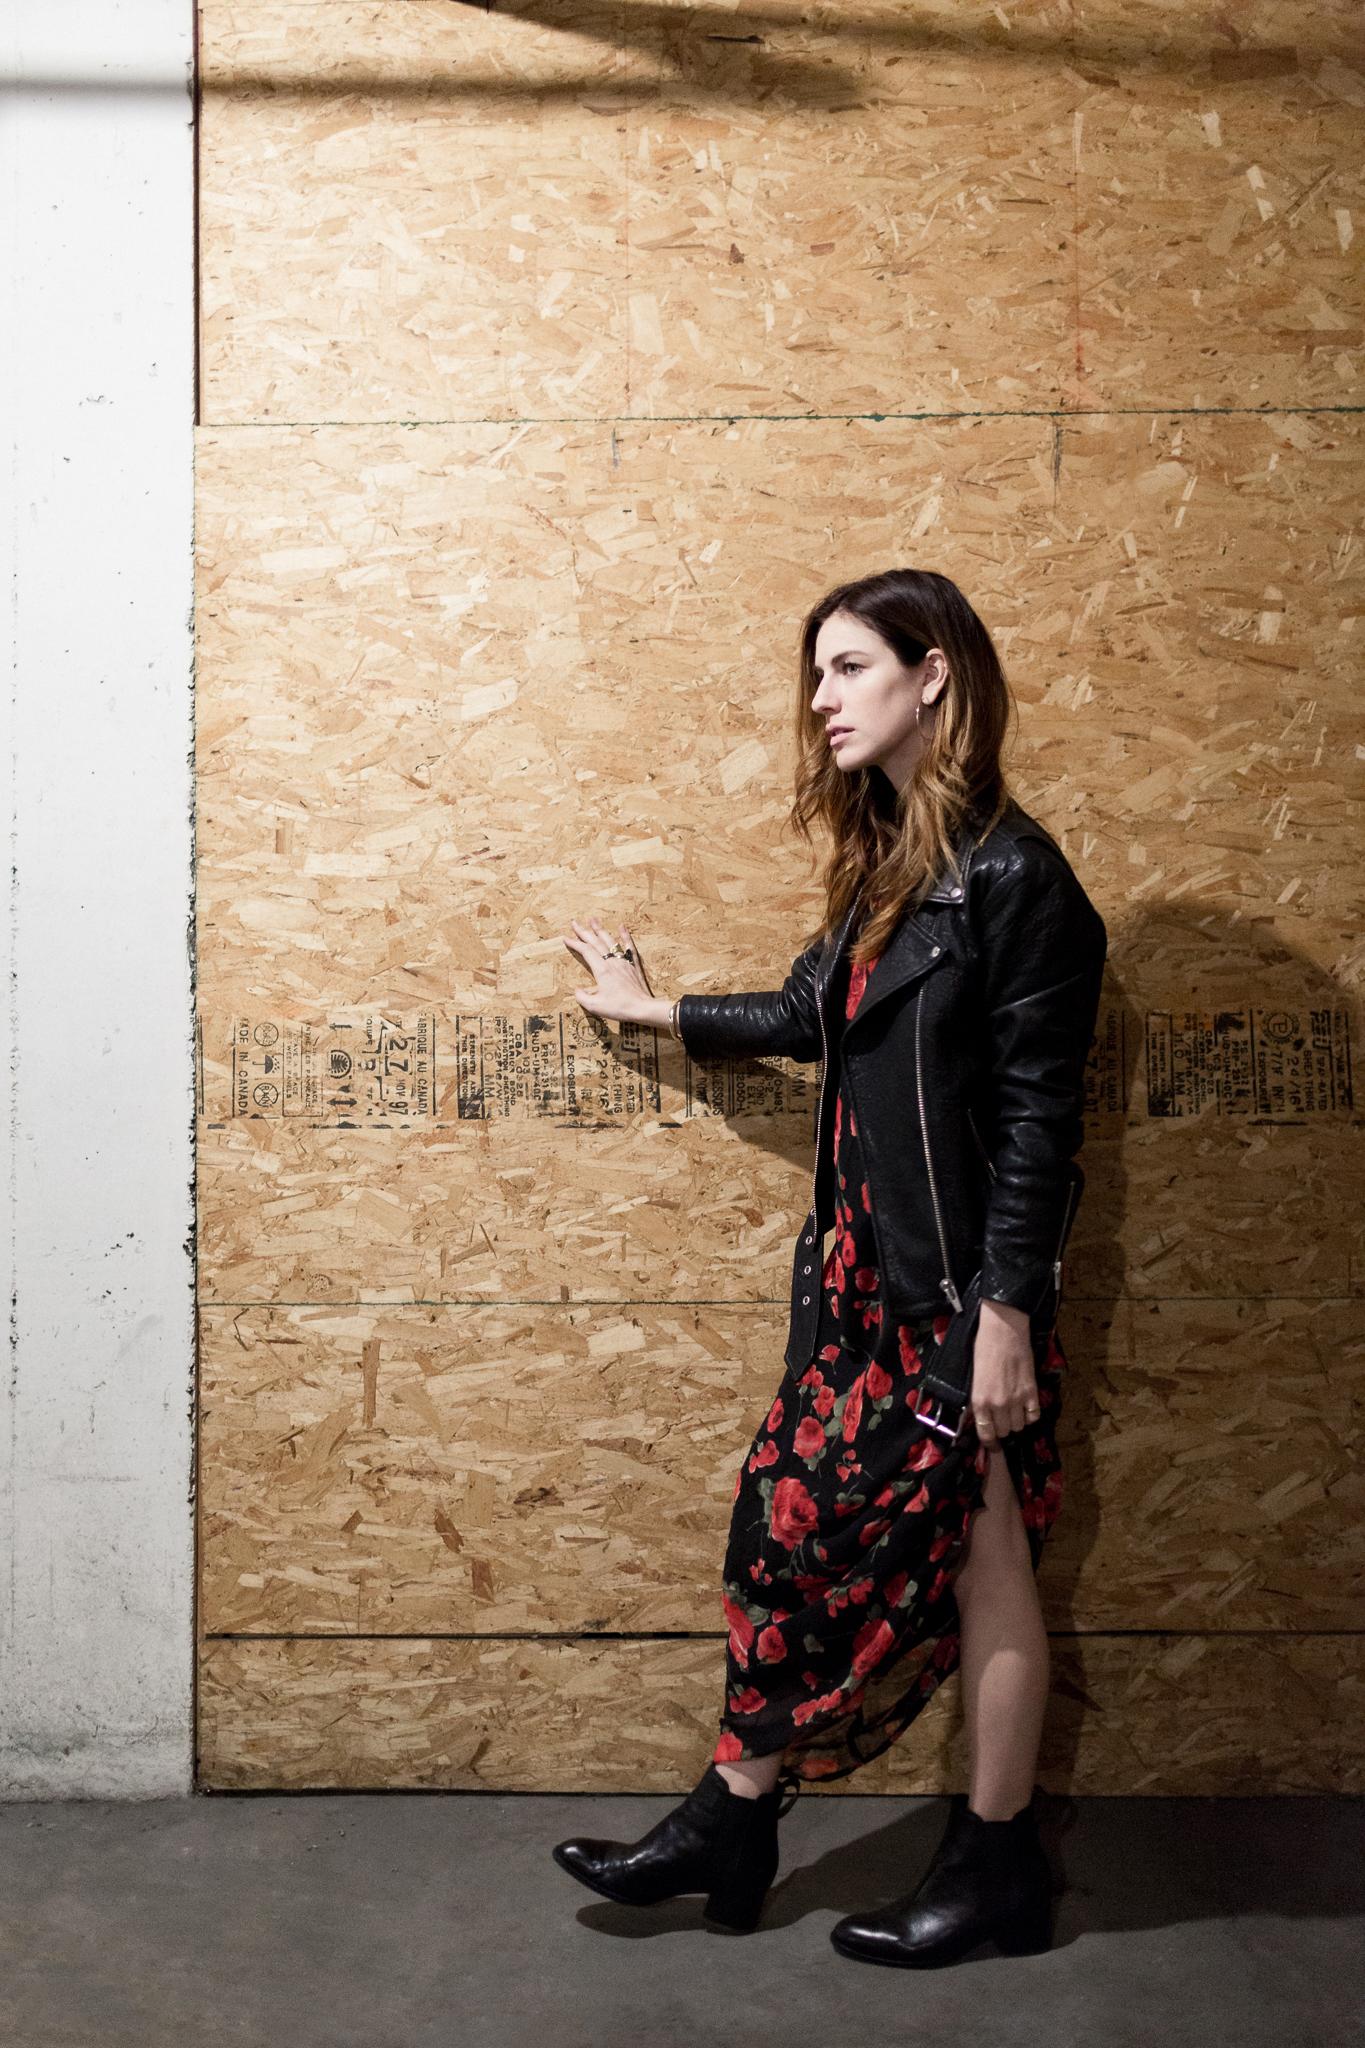 anna_e_cottrell_eldridge_edit_rose_noir_fashion_blogger_vintage_90s_rose maxi_dress_veda_black_leather_jayne_jacket_rag_and_bone_chelsea_boot_styling_mgb_photo_3.jpg